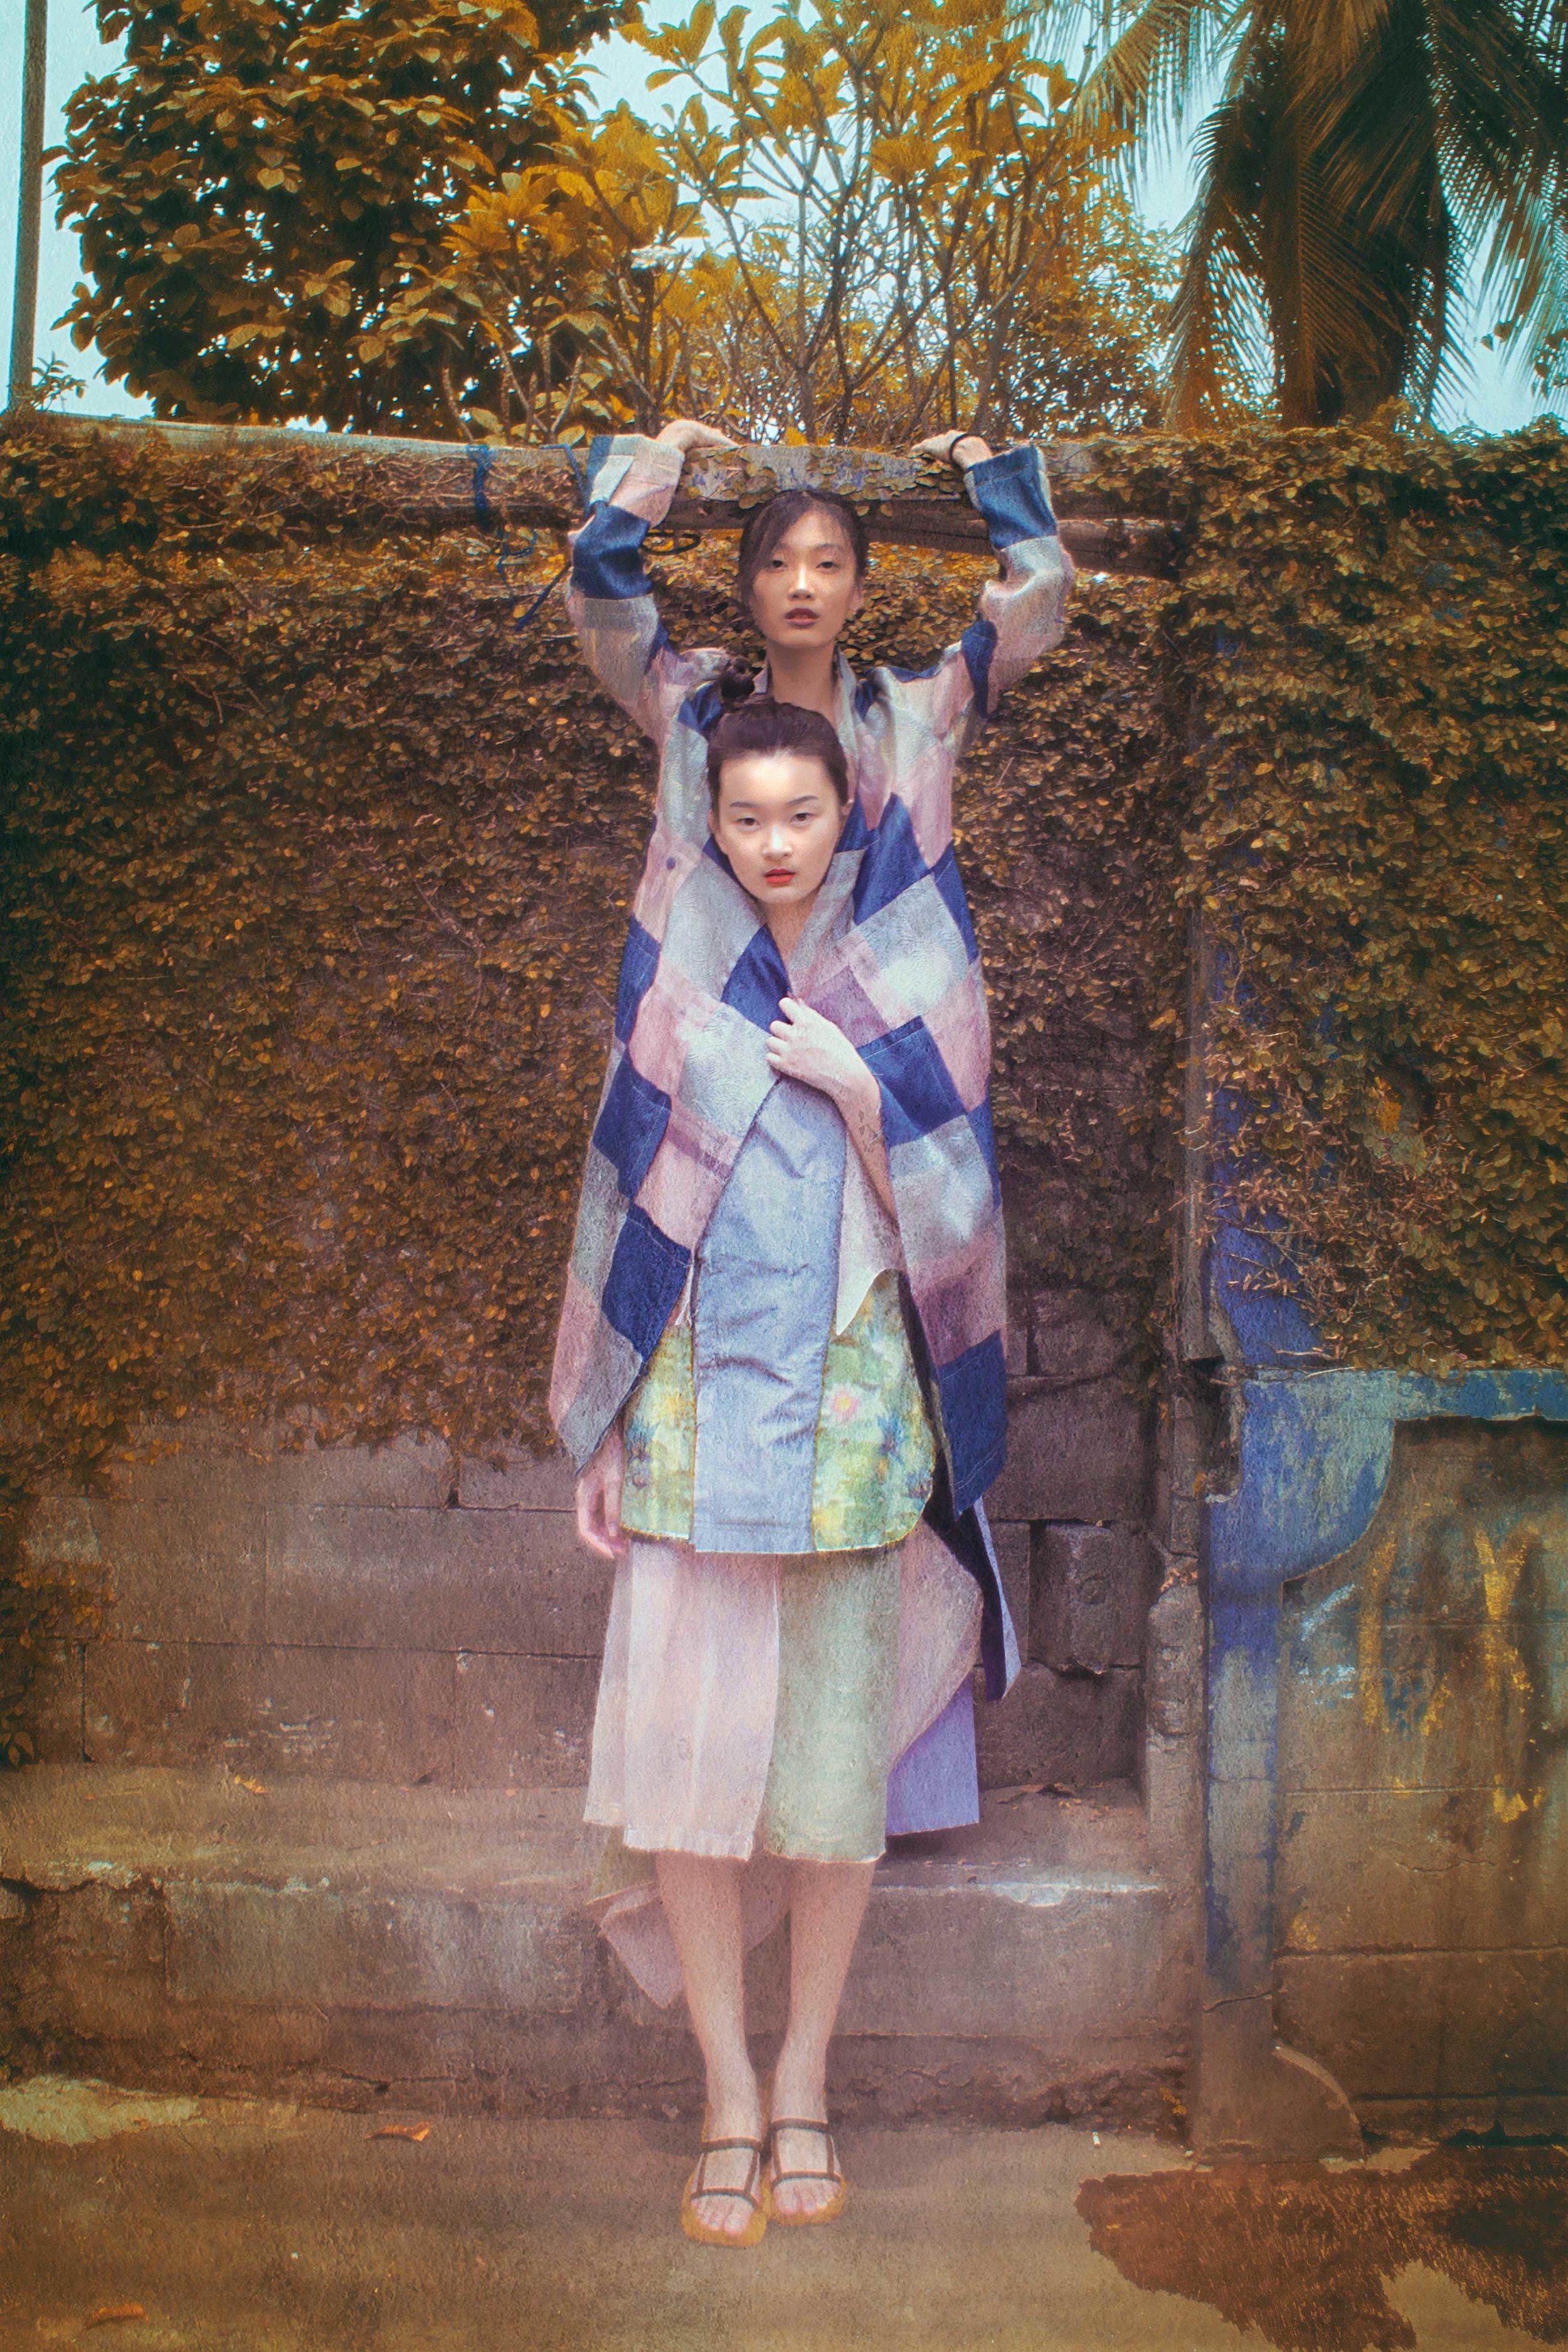 on Zeline: coat by TANGAN, pants by Aesthetic Pleasure  on Clarita: top, skirt, shoes by TANGAN